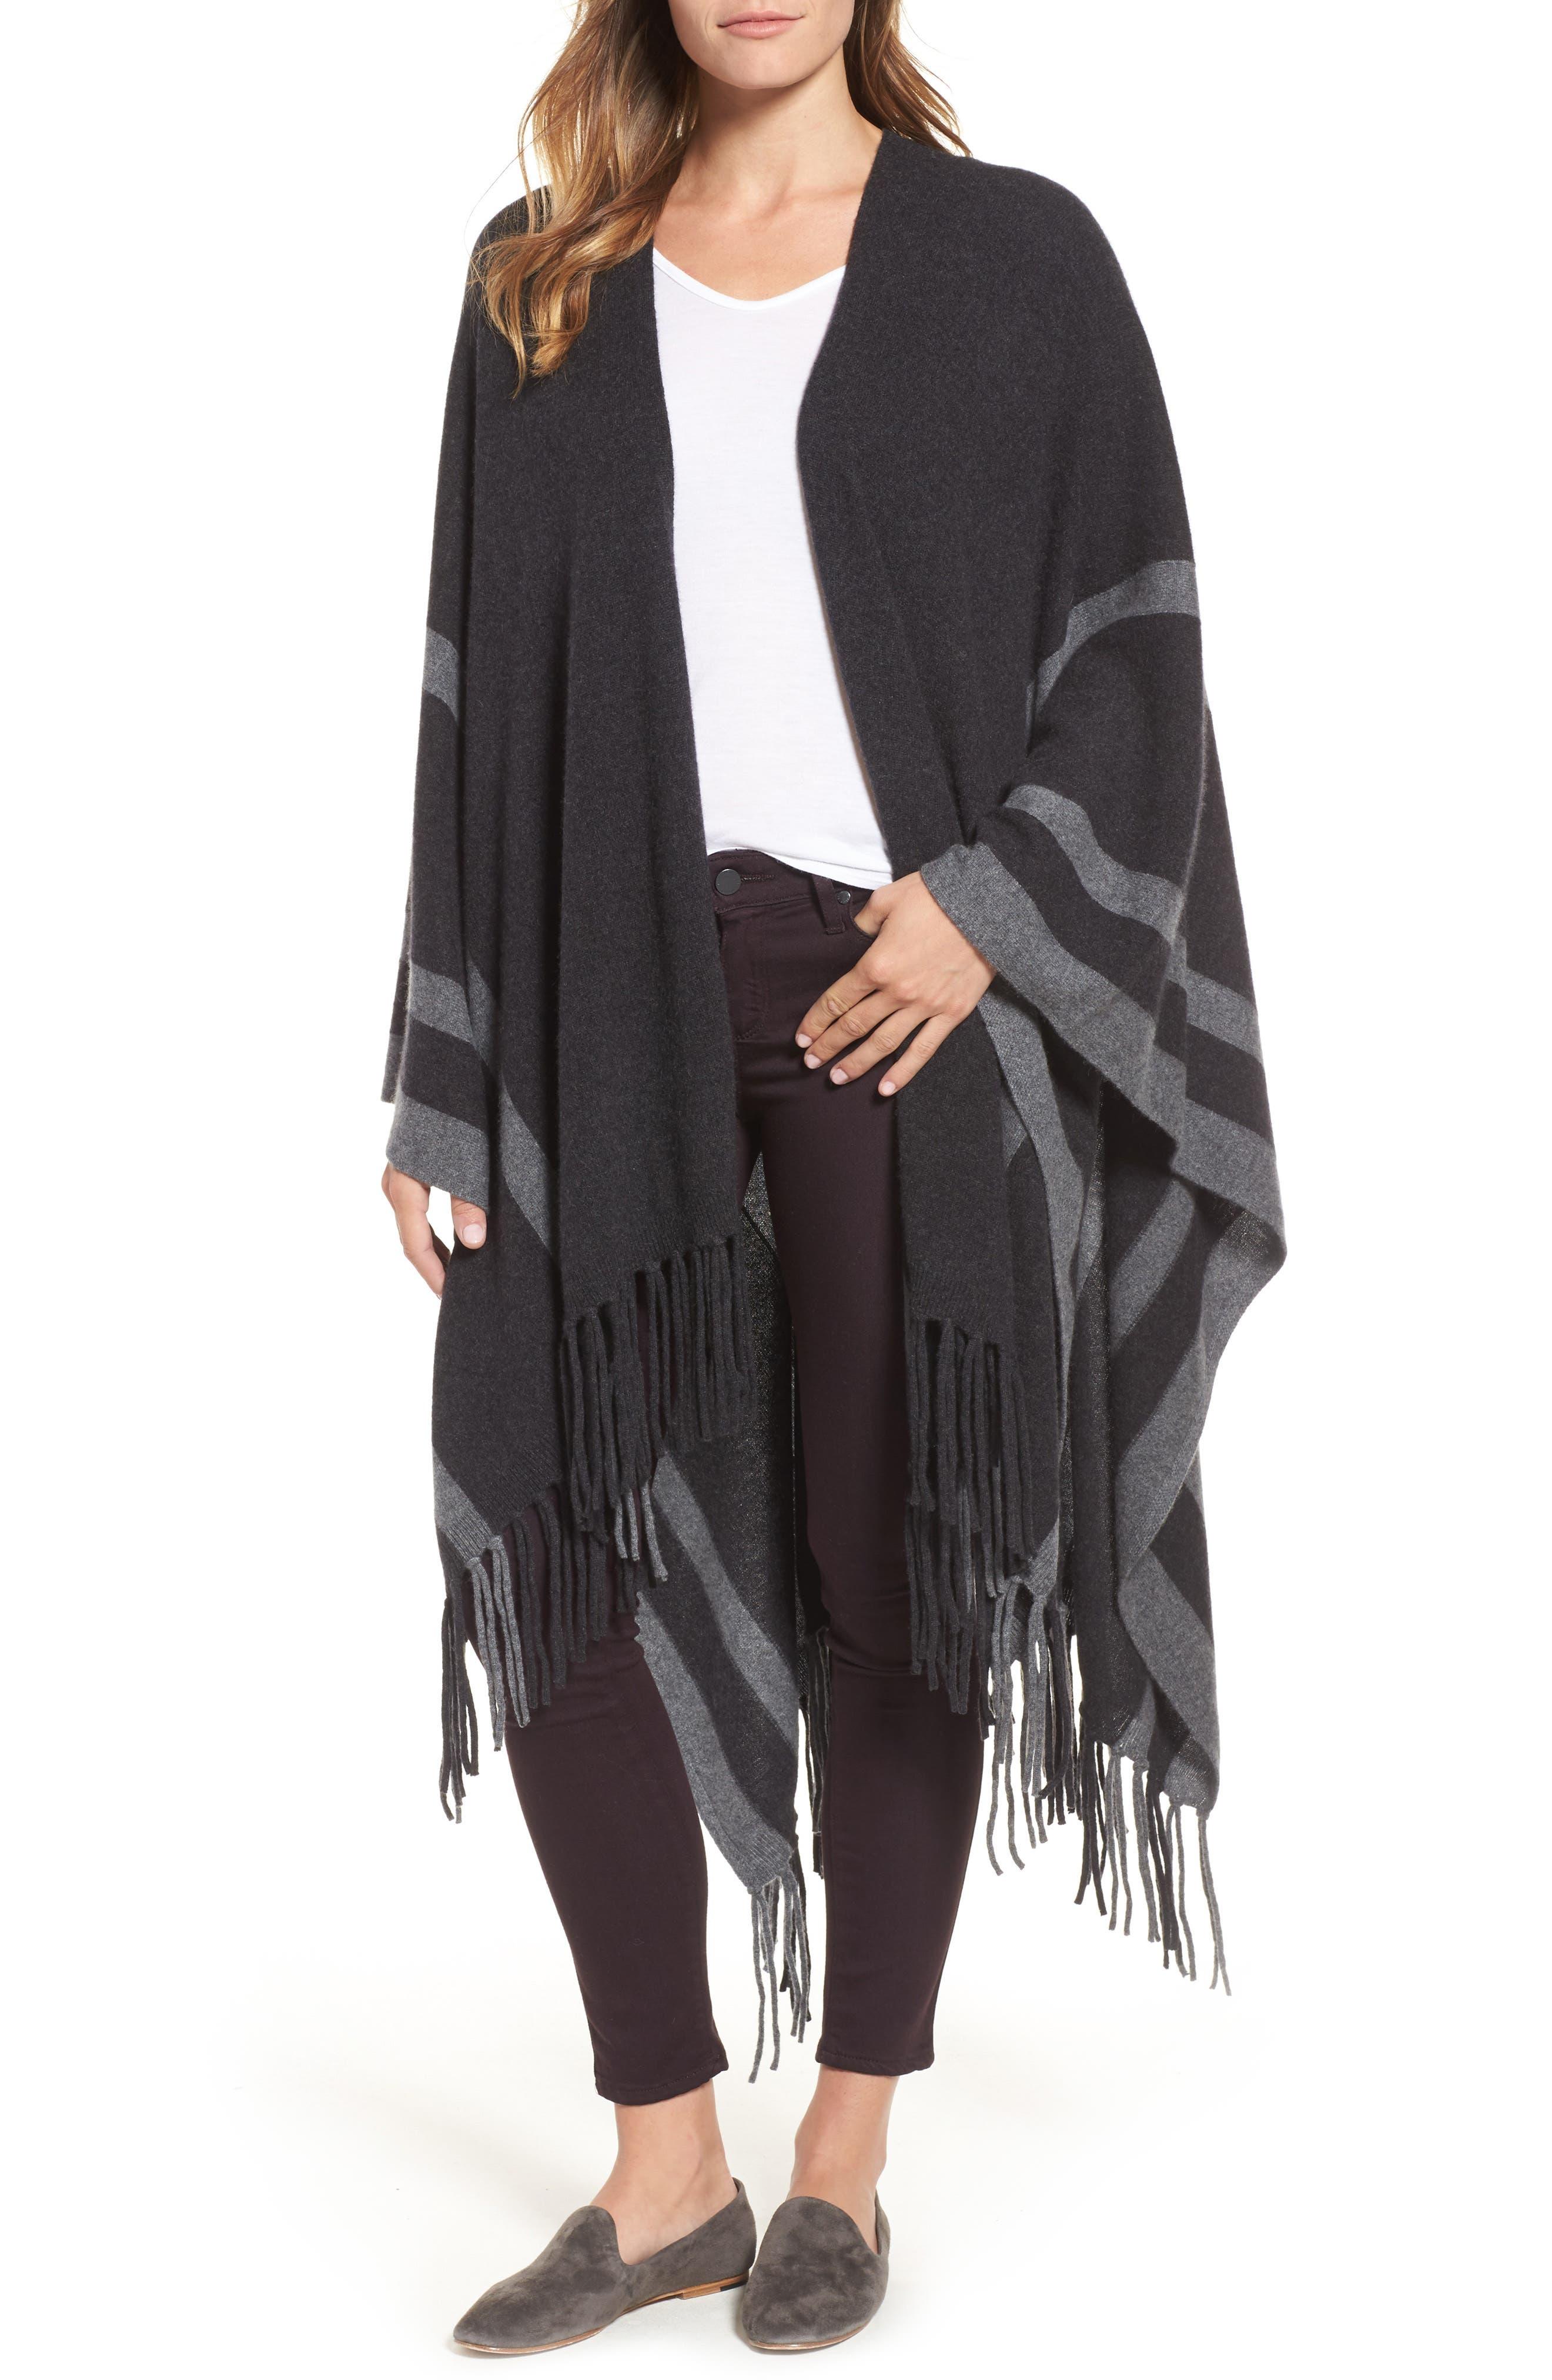 Luxe Stripe Cashmere Ruana,                         Main,                         color, Black Rock Heather Combo